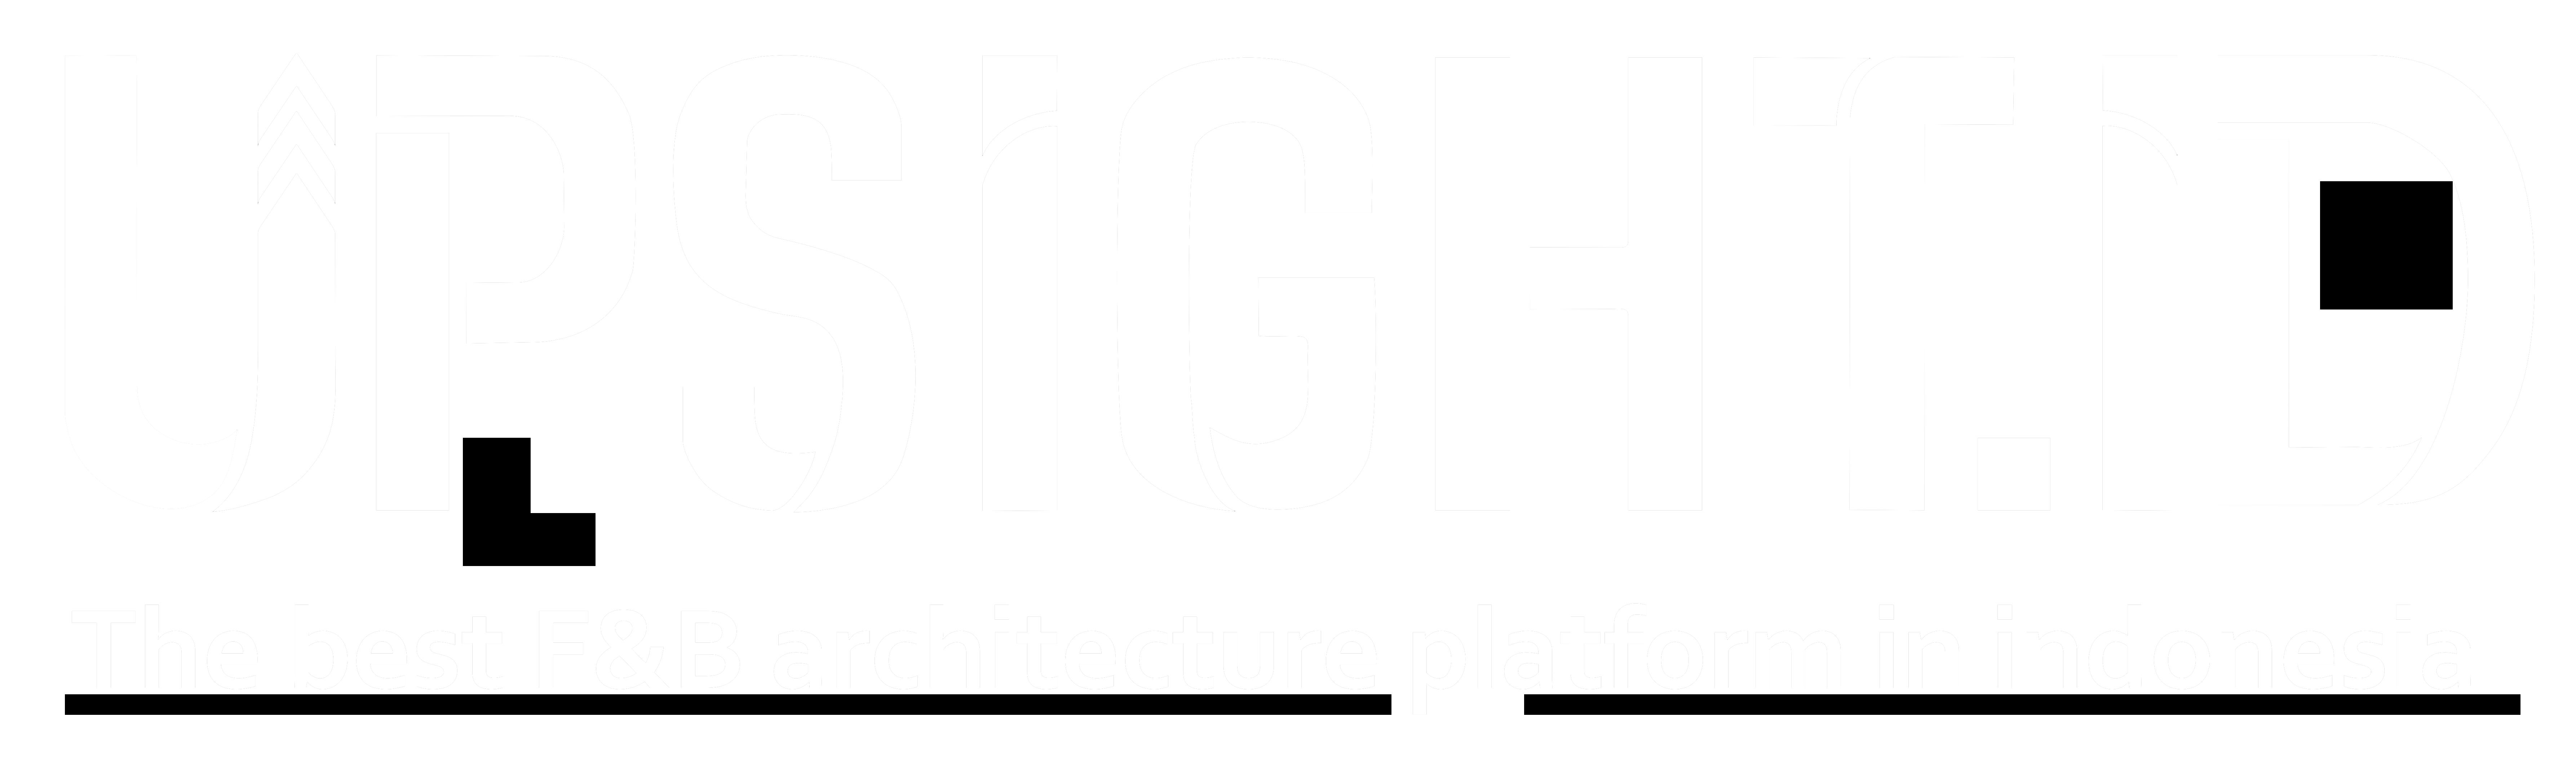 upsight.id – The Best F&B Architecture Platform in Indonesia